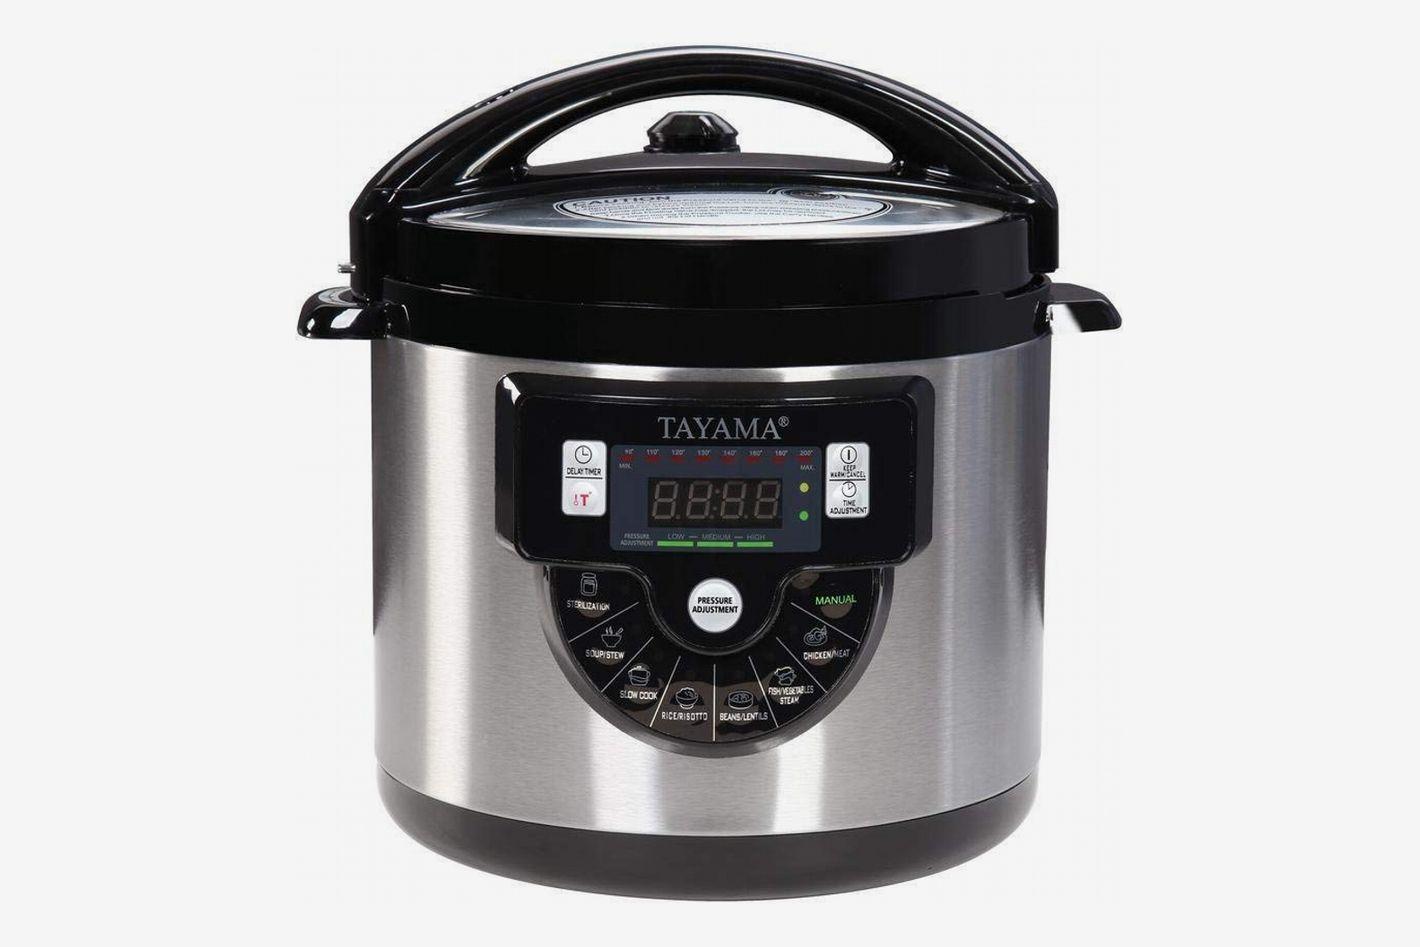 Tayama TMC-60XL 6 quart 8-in-1 Multi-Function Pressure Cooker